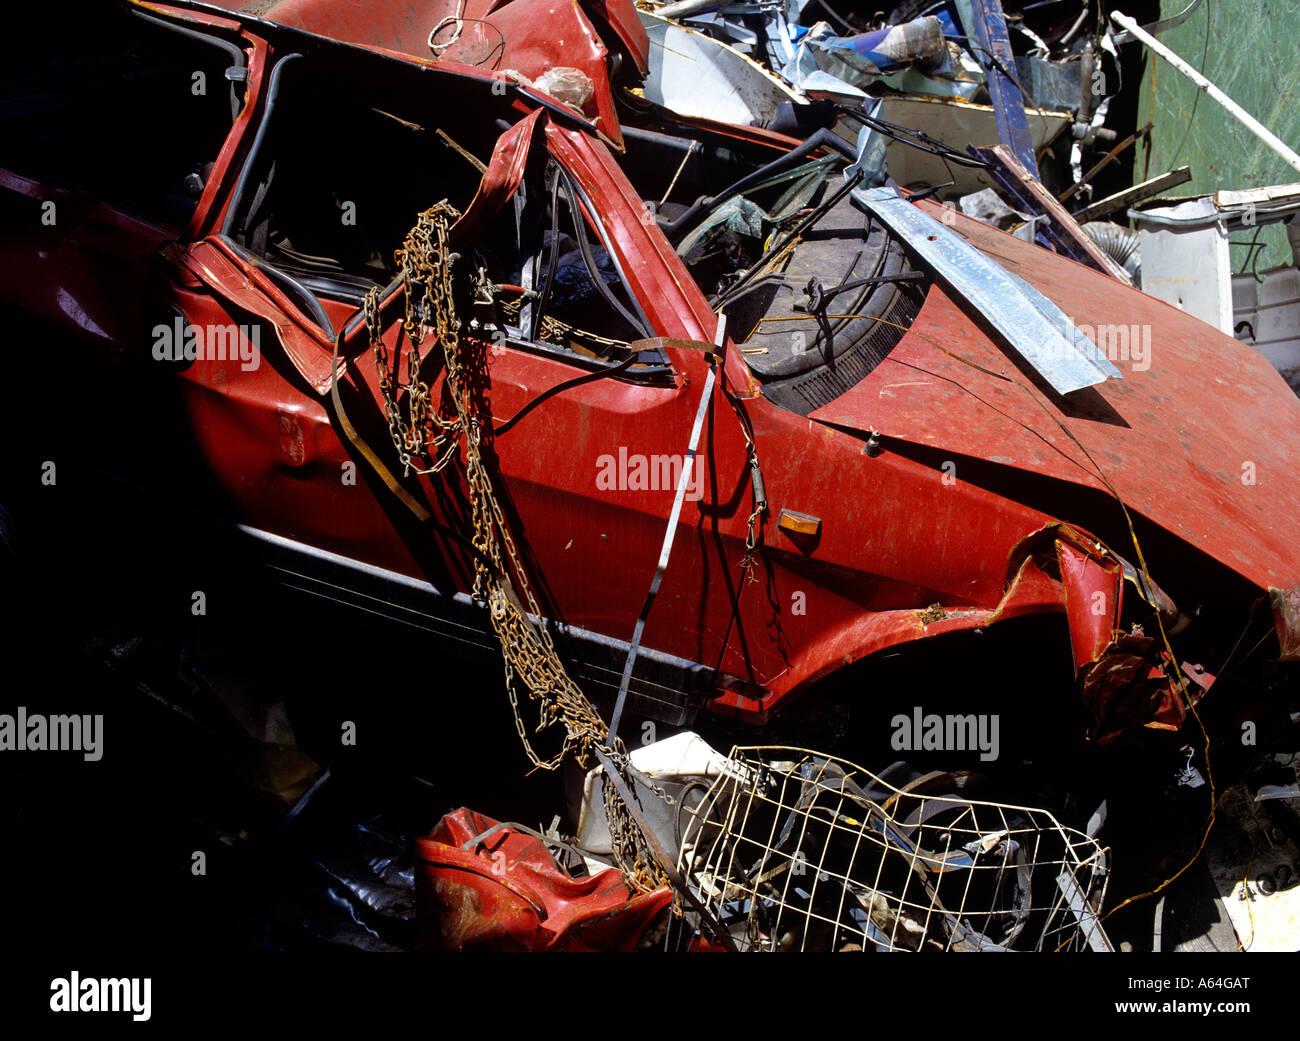 car wreck and scrap at recycling scrap yard Stock Photo